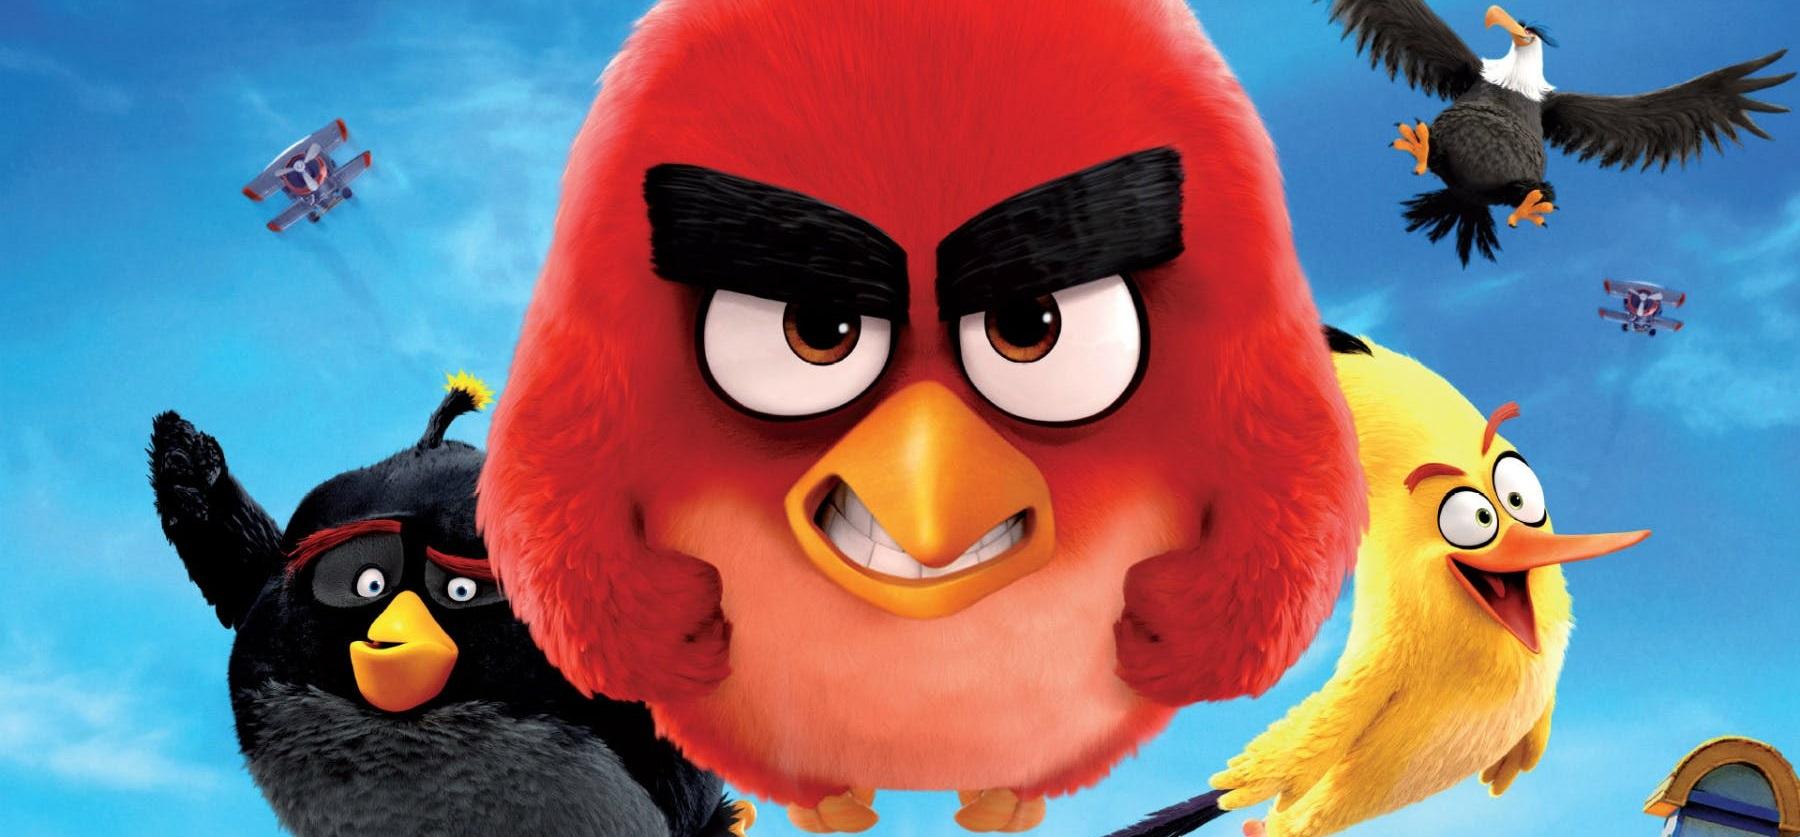 182545-angry-birds-movie-2-sequel.jpg